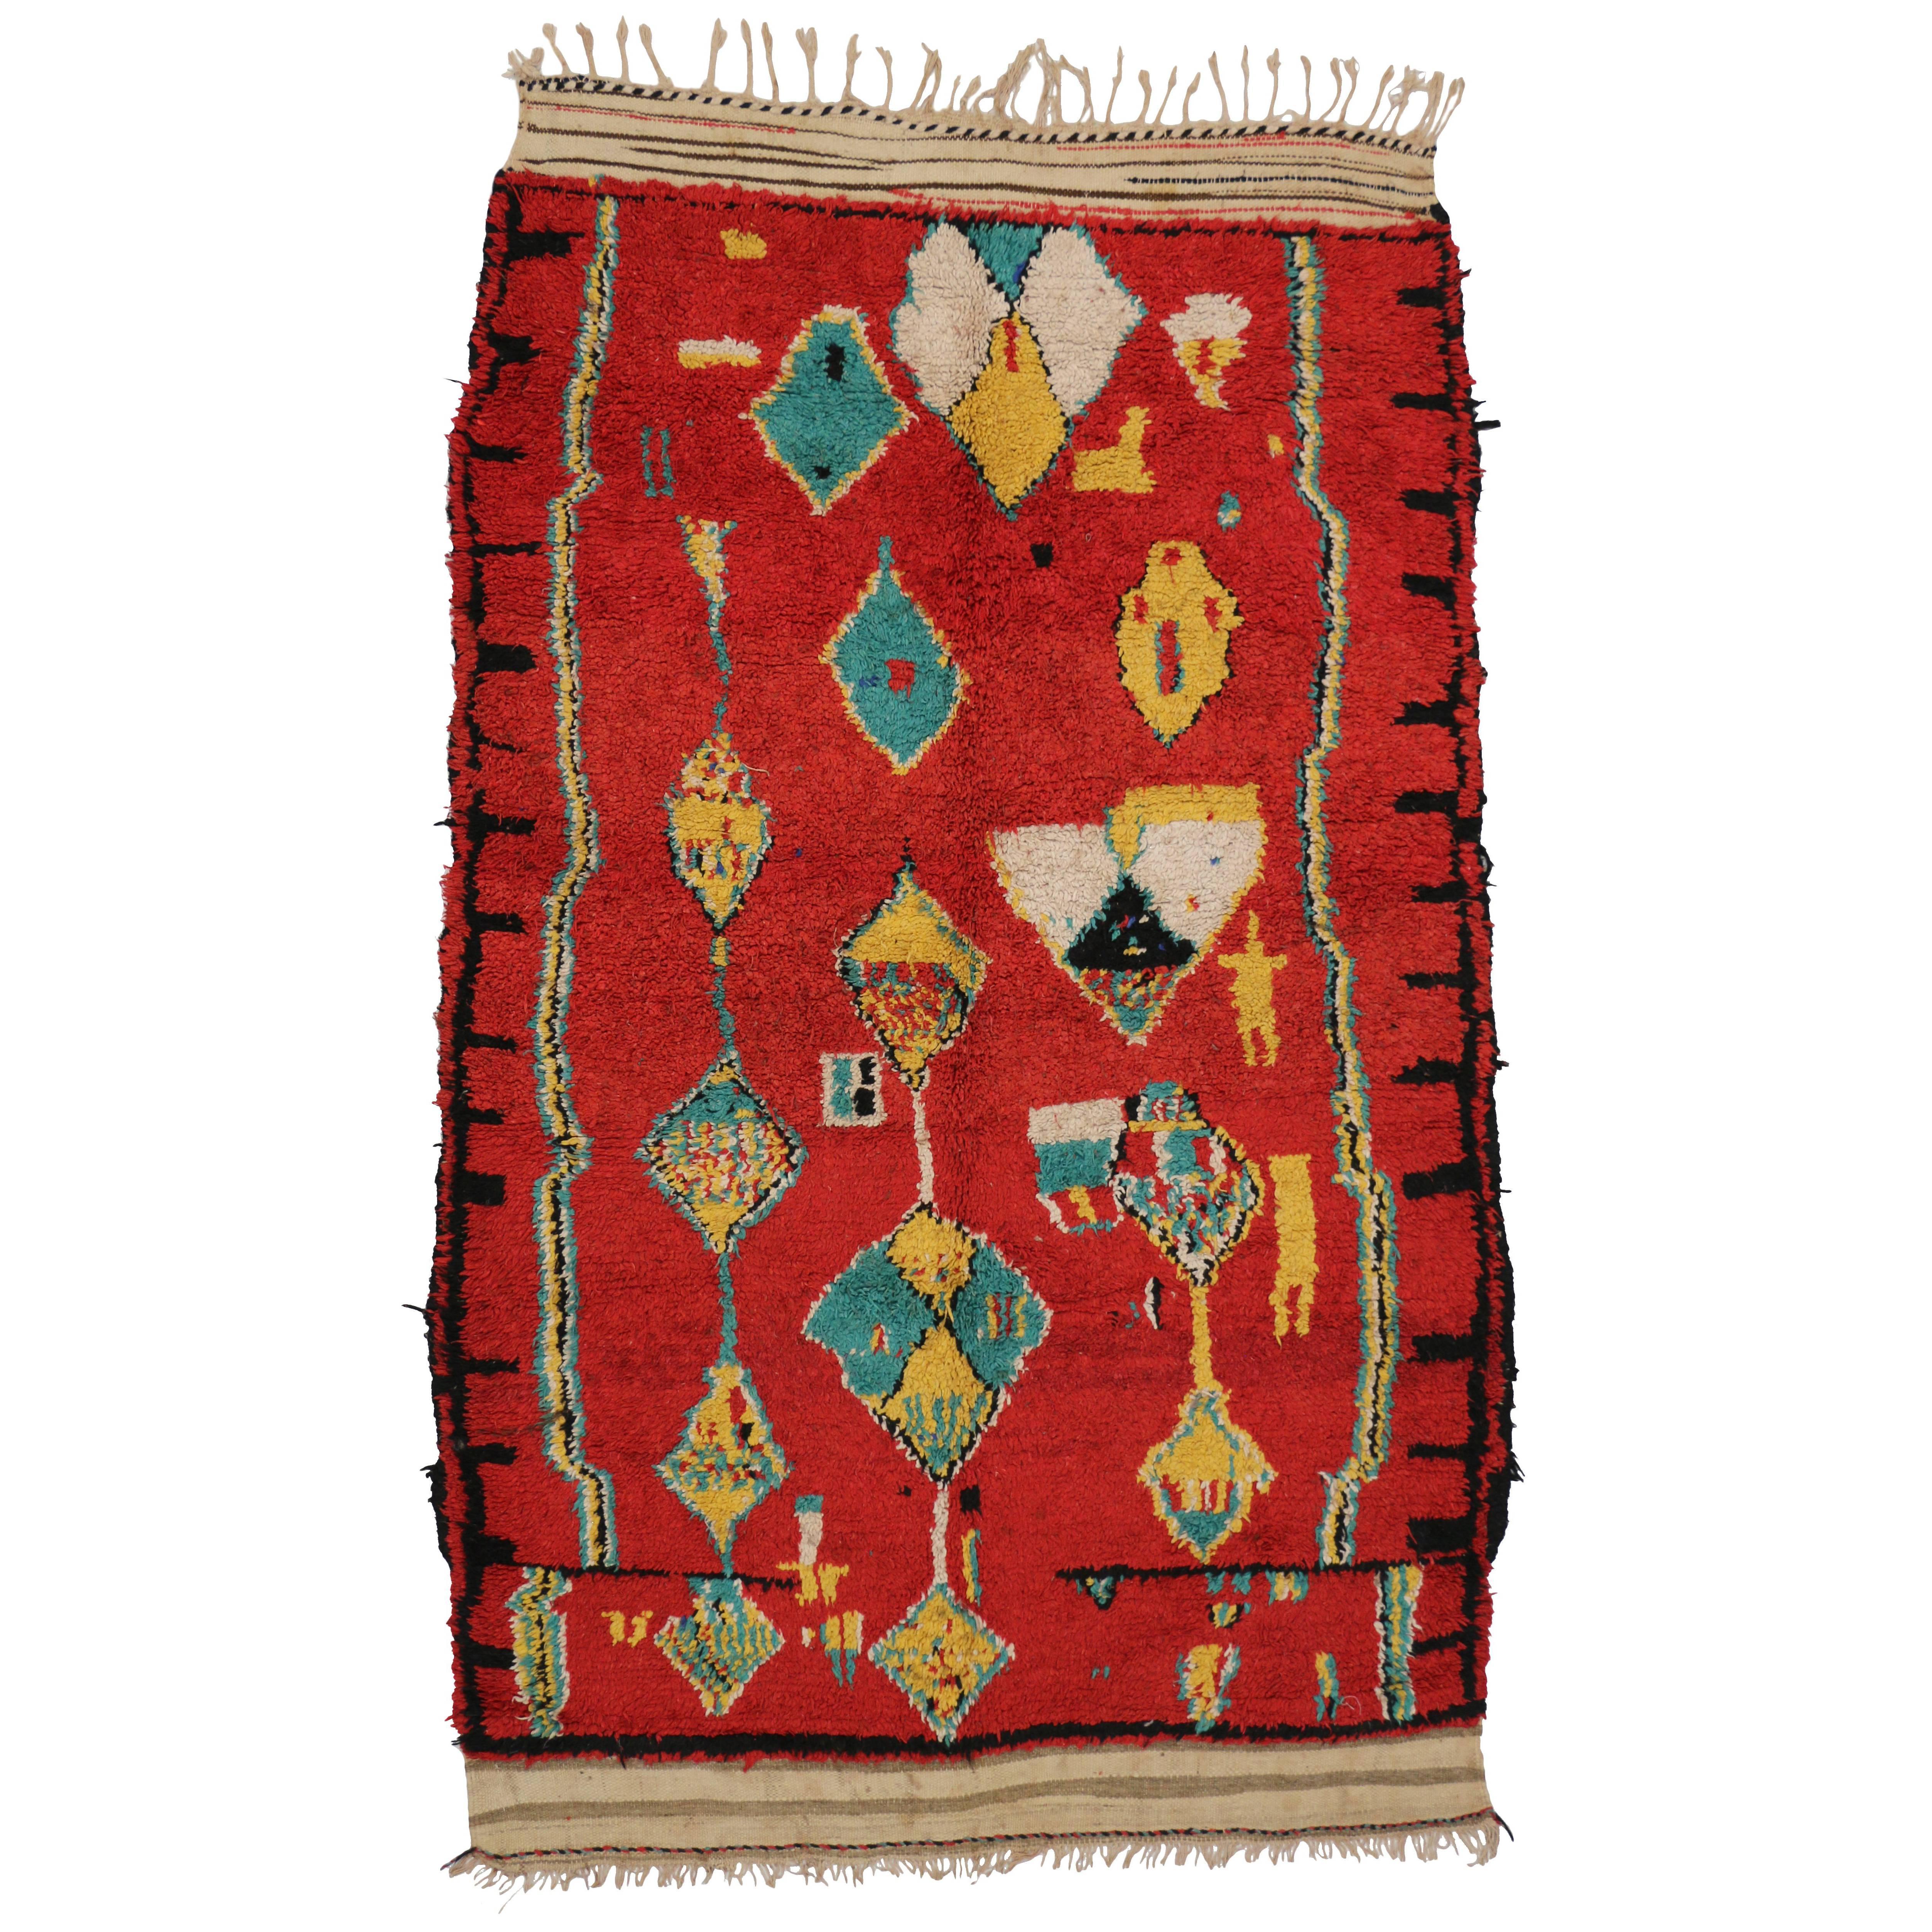 Vintage Red Moroccan Rug, Modern Tribal Style Berber Moroccan Rug